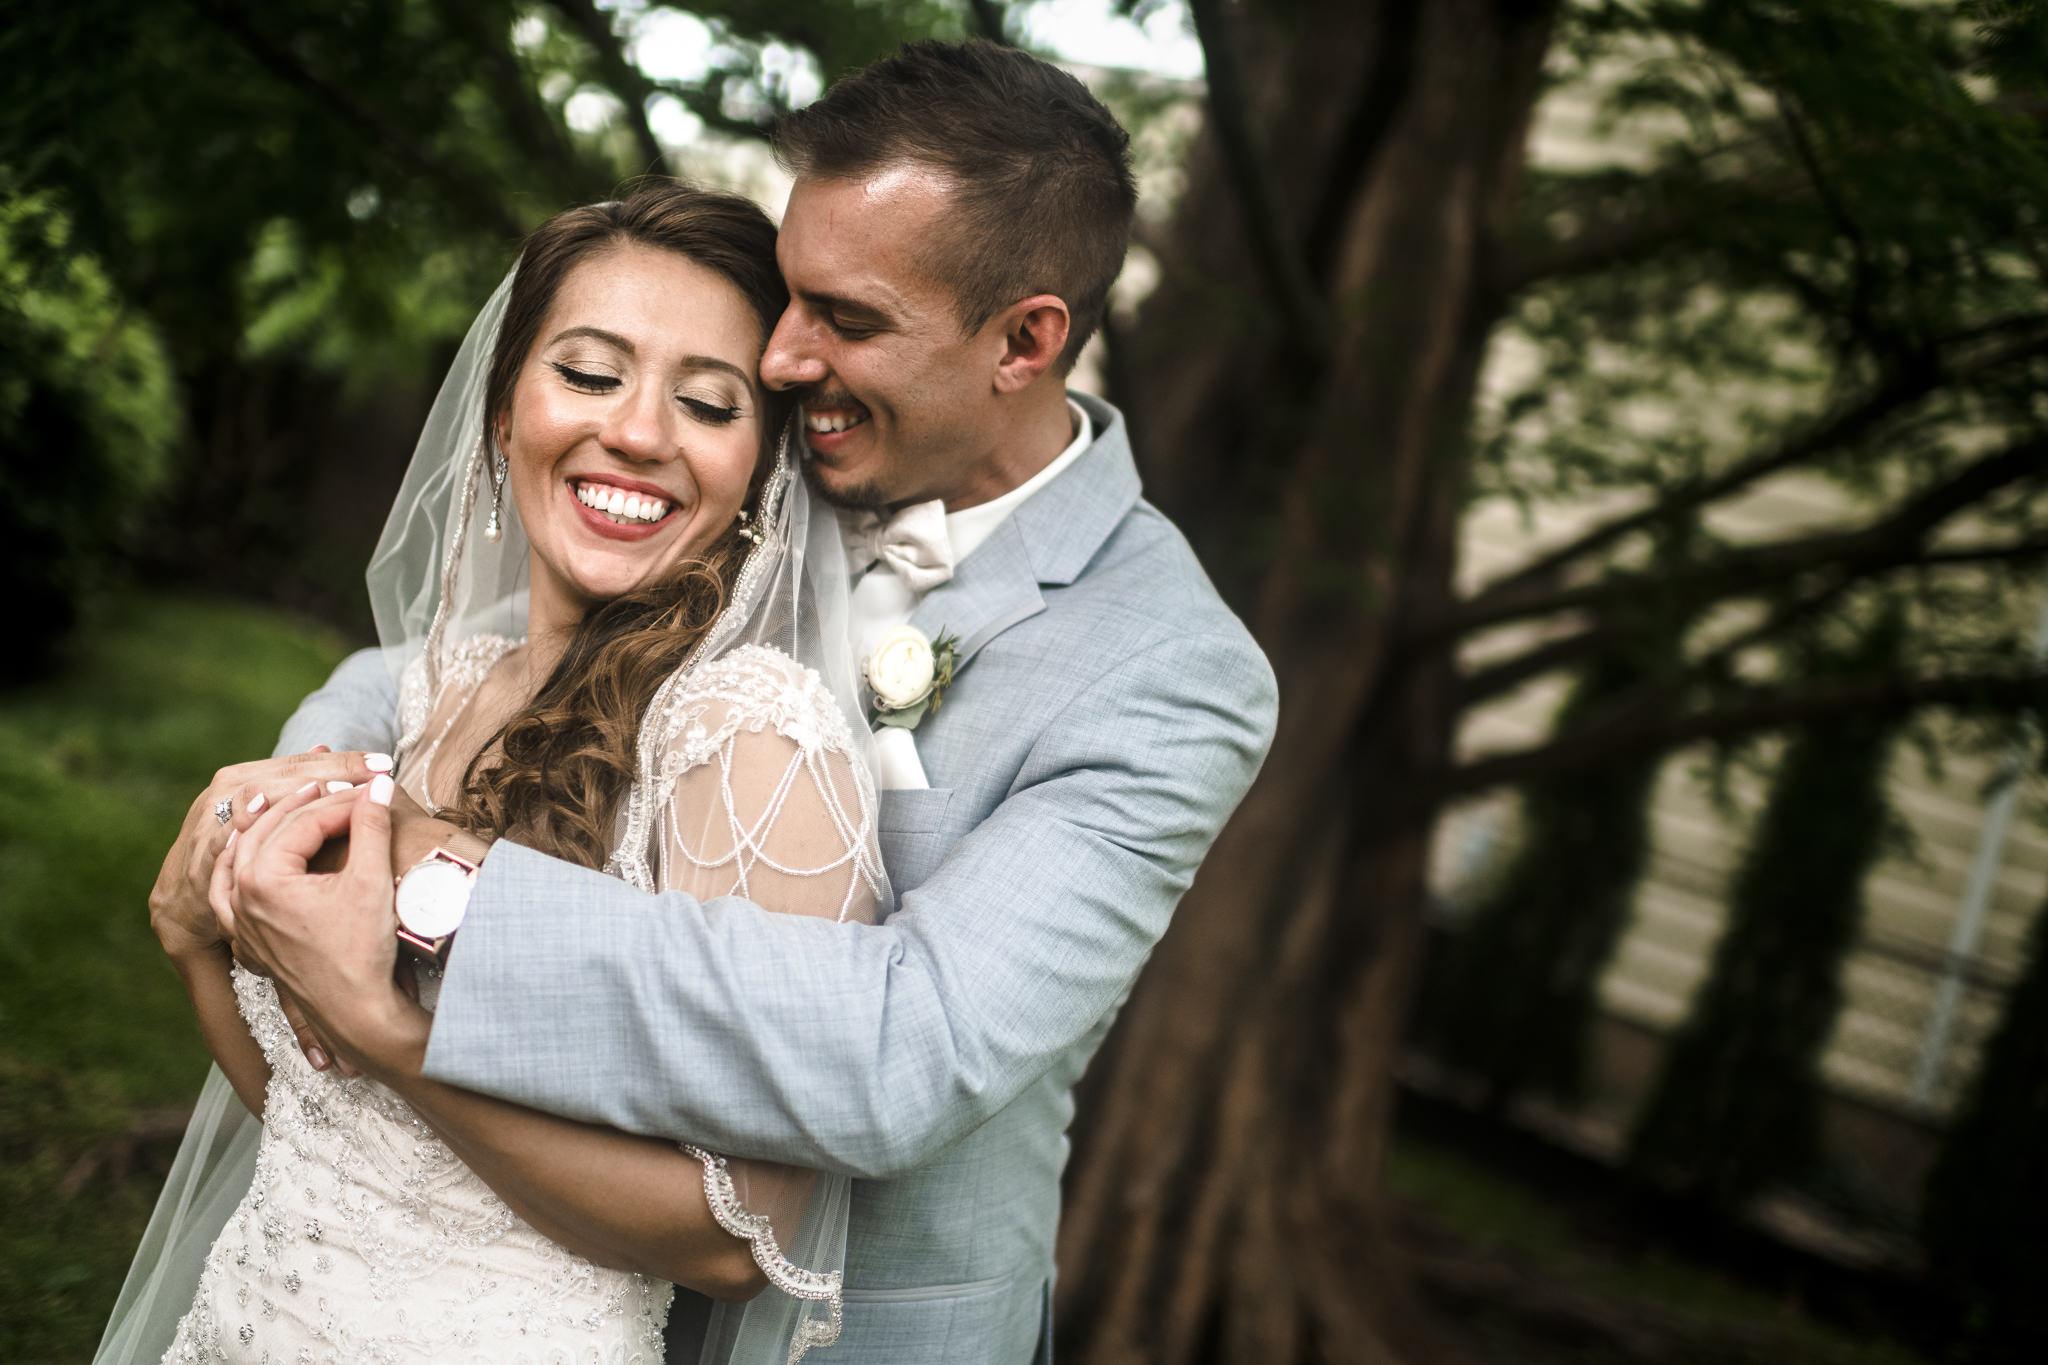 Barbato-Moorestown-Community-House-Wedding-New-Jersey-Photographer-19.JPG